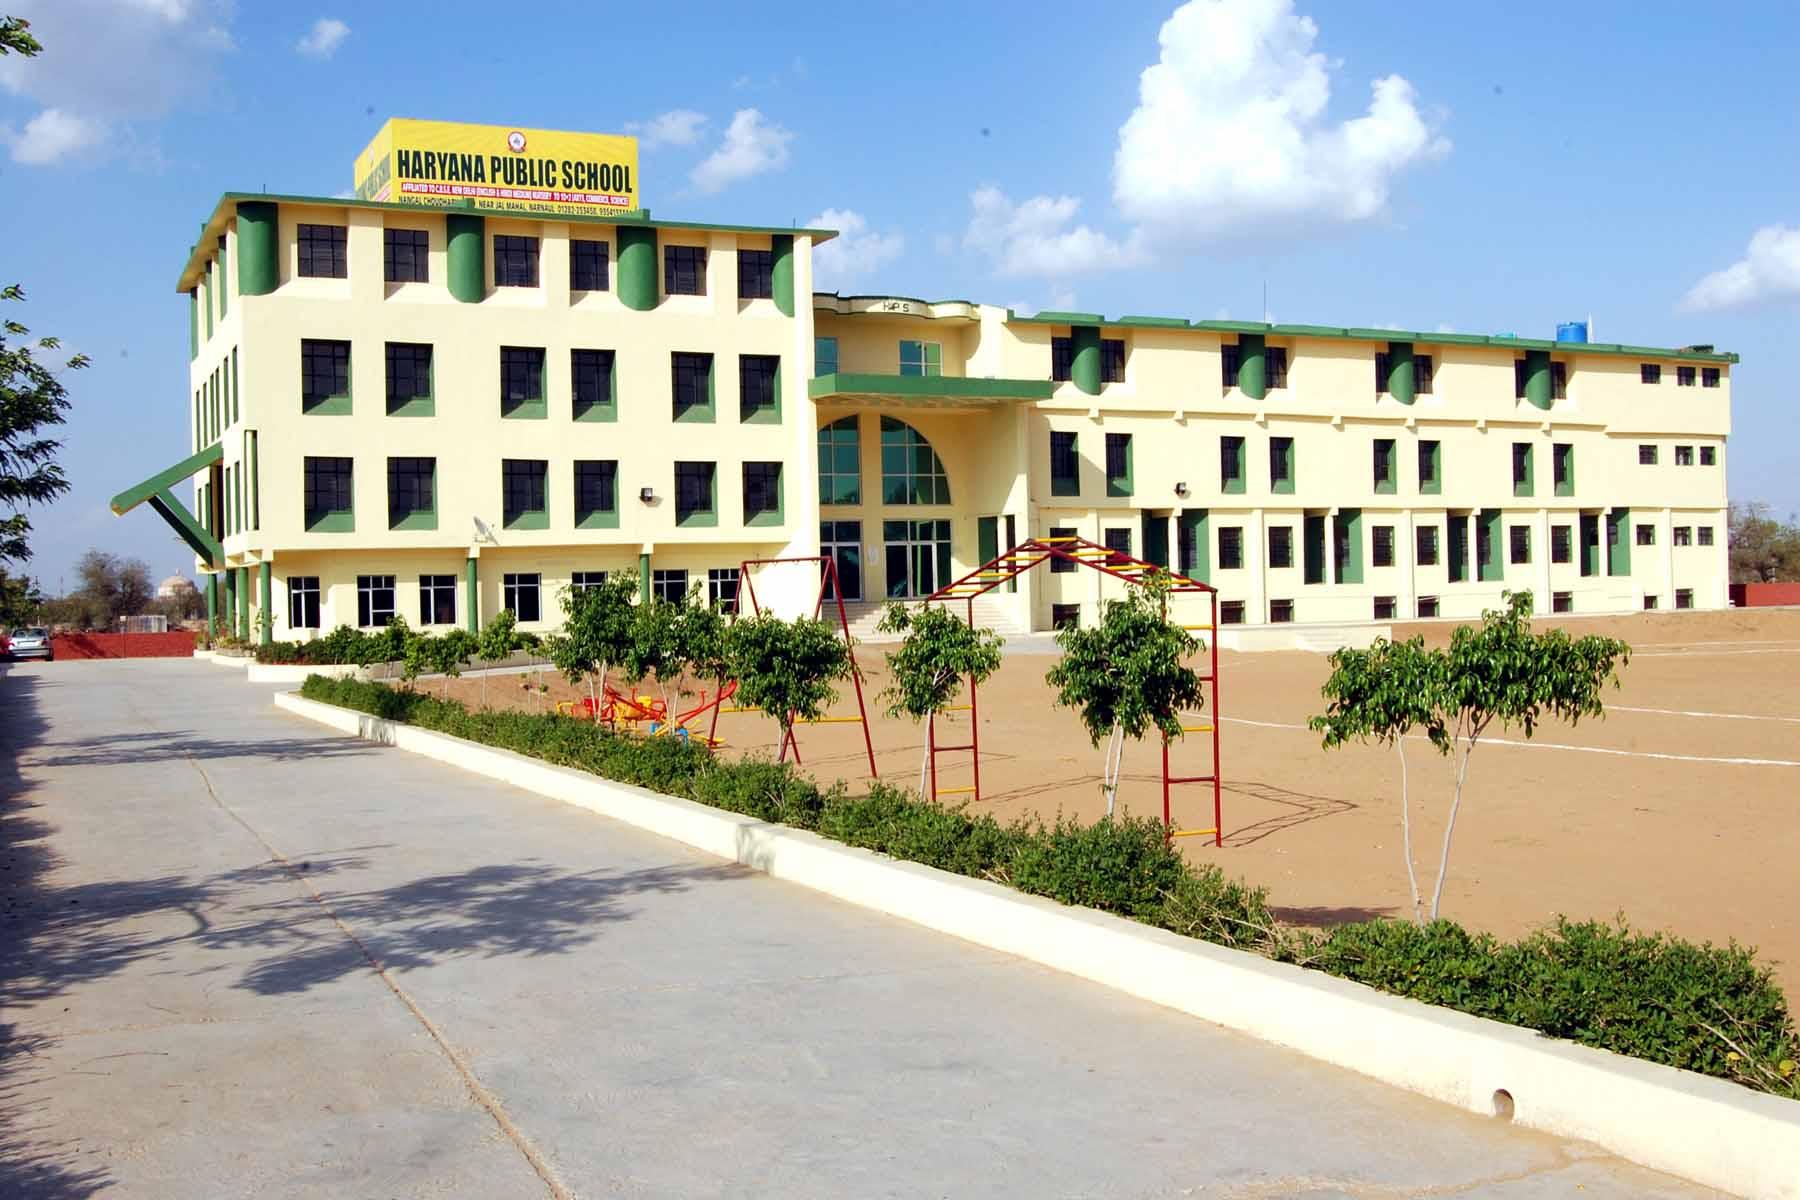 HARYANA PUBLIC SCHOOL NANGAL CHOUDHARY ROAD 530646